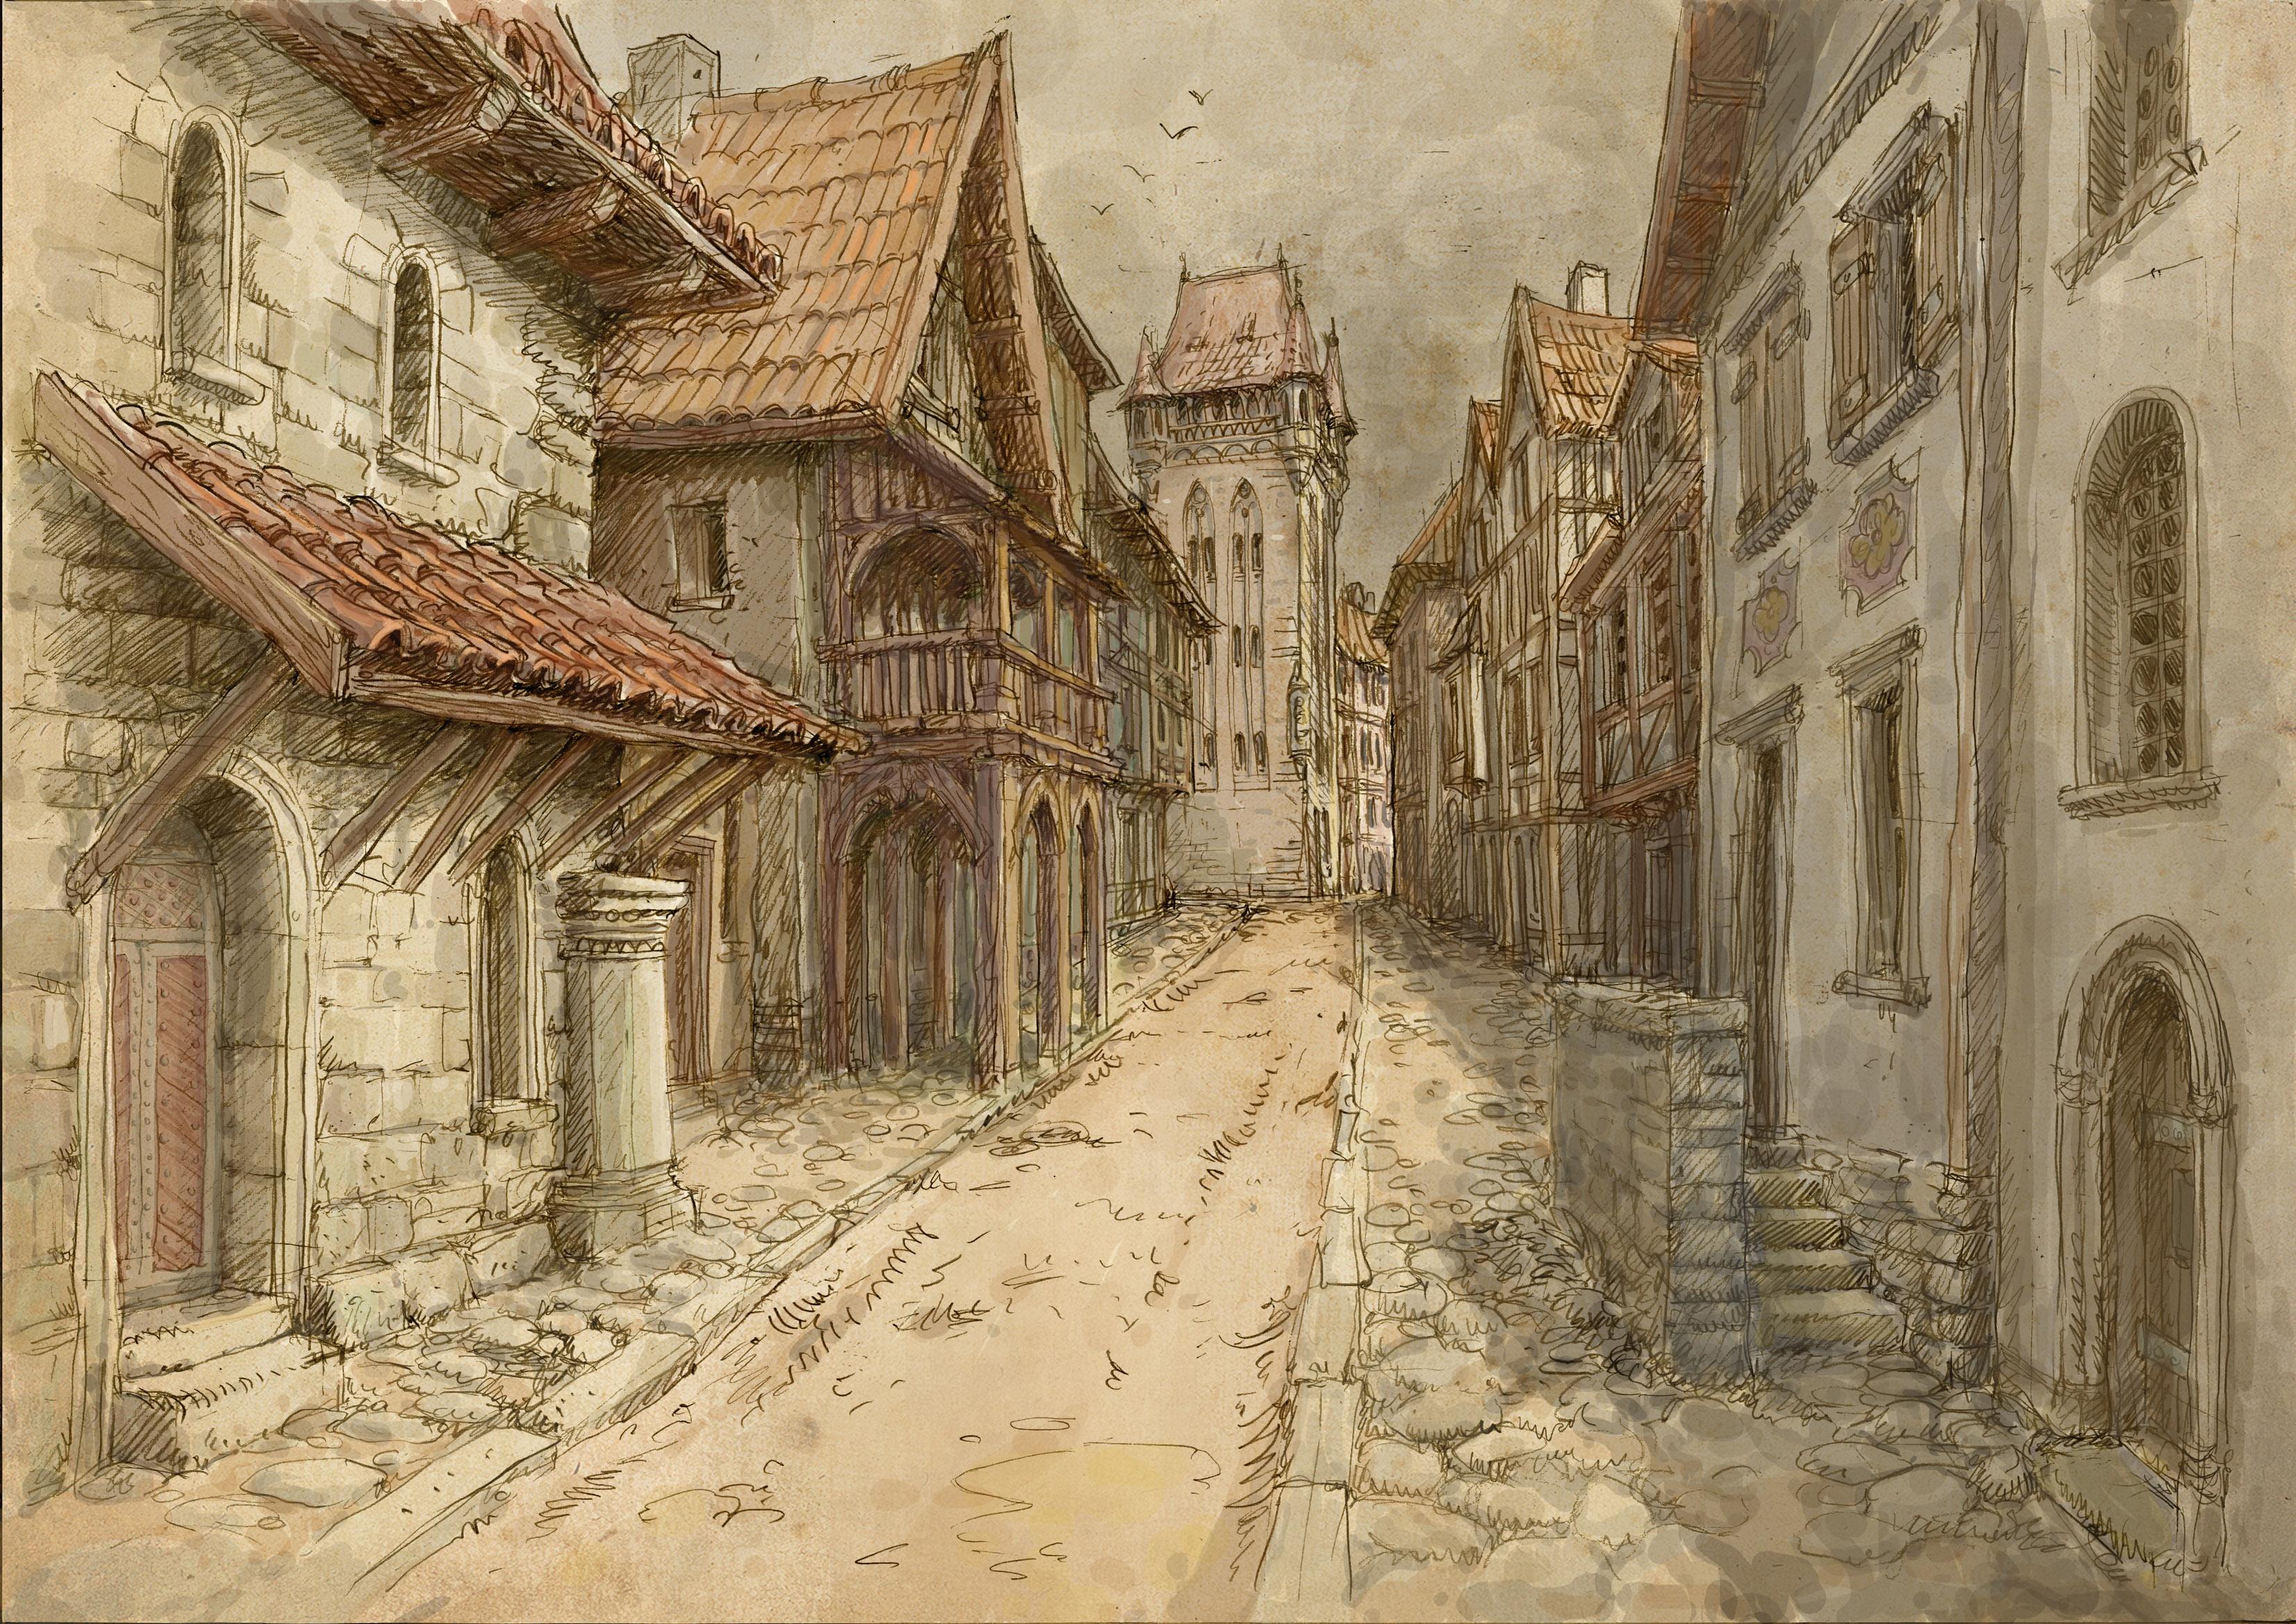 medieval_town_by_hetman80-d37zunh.jpg